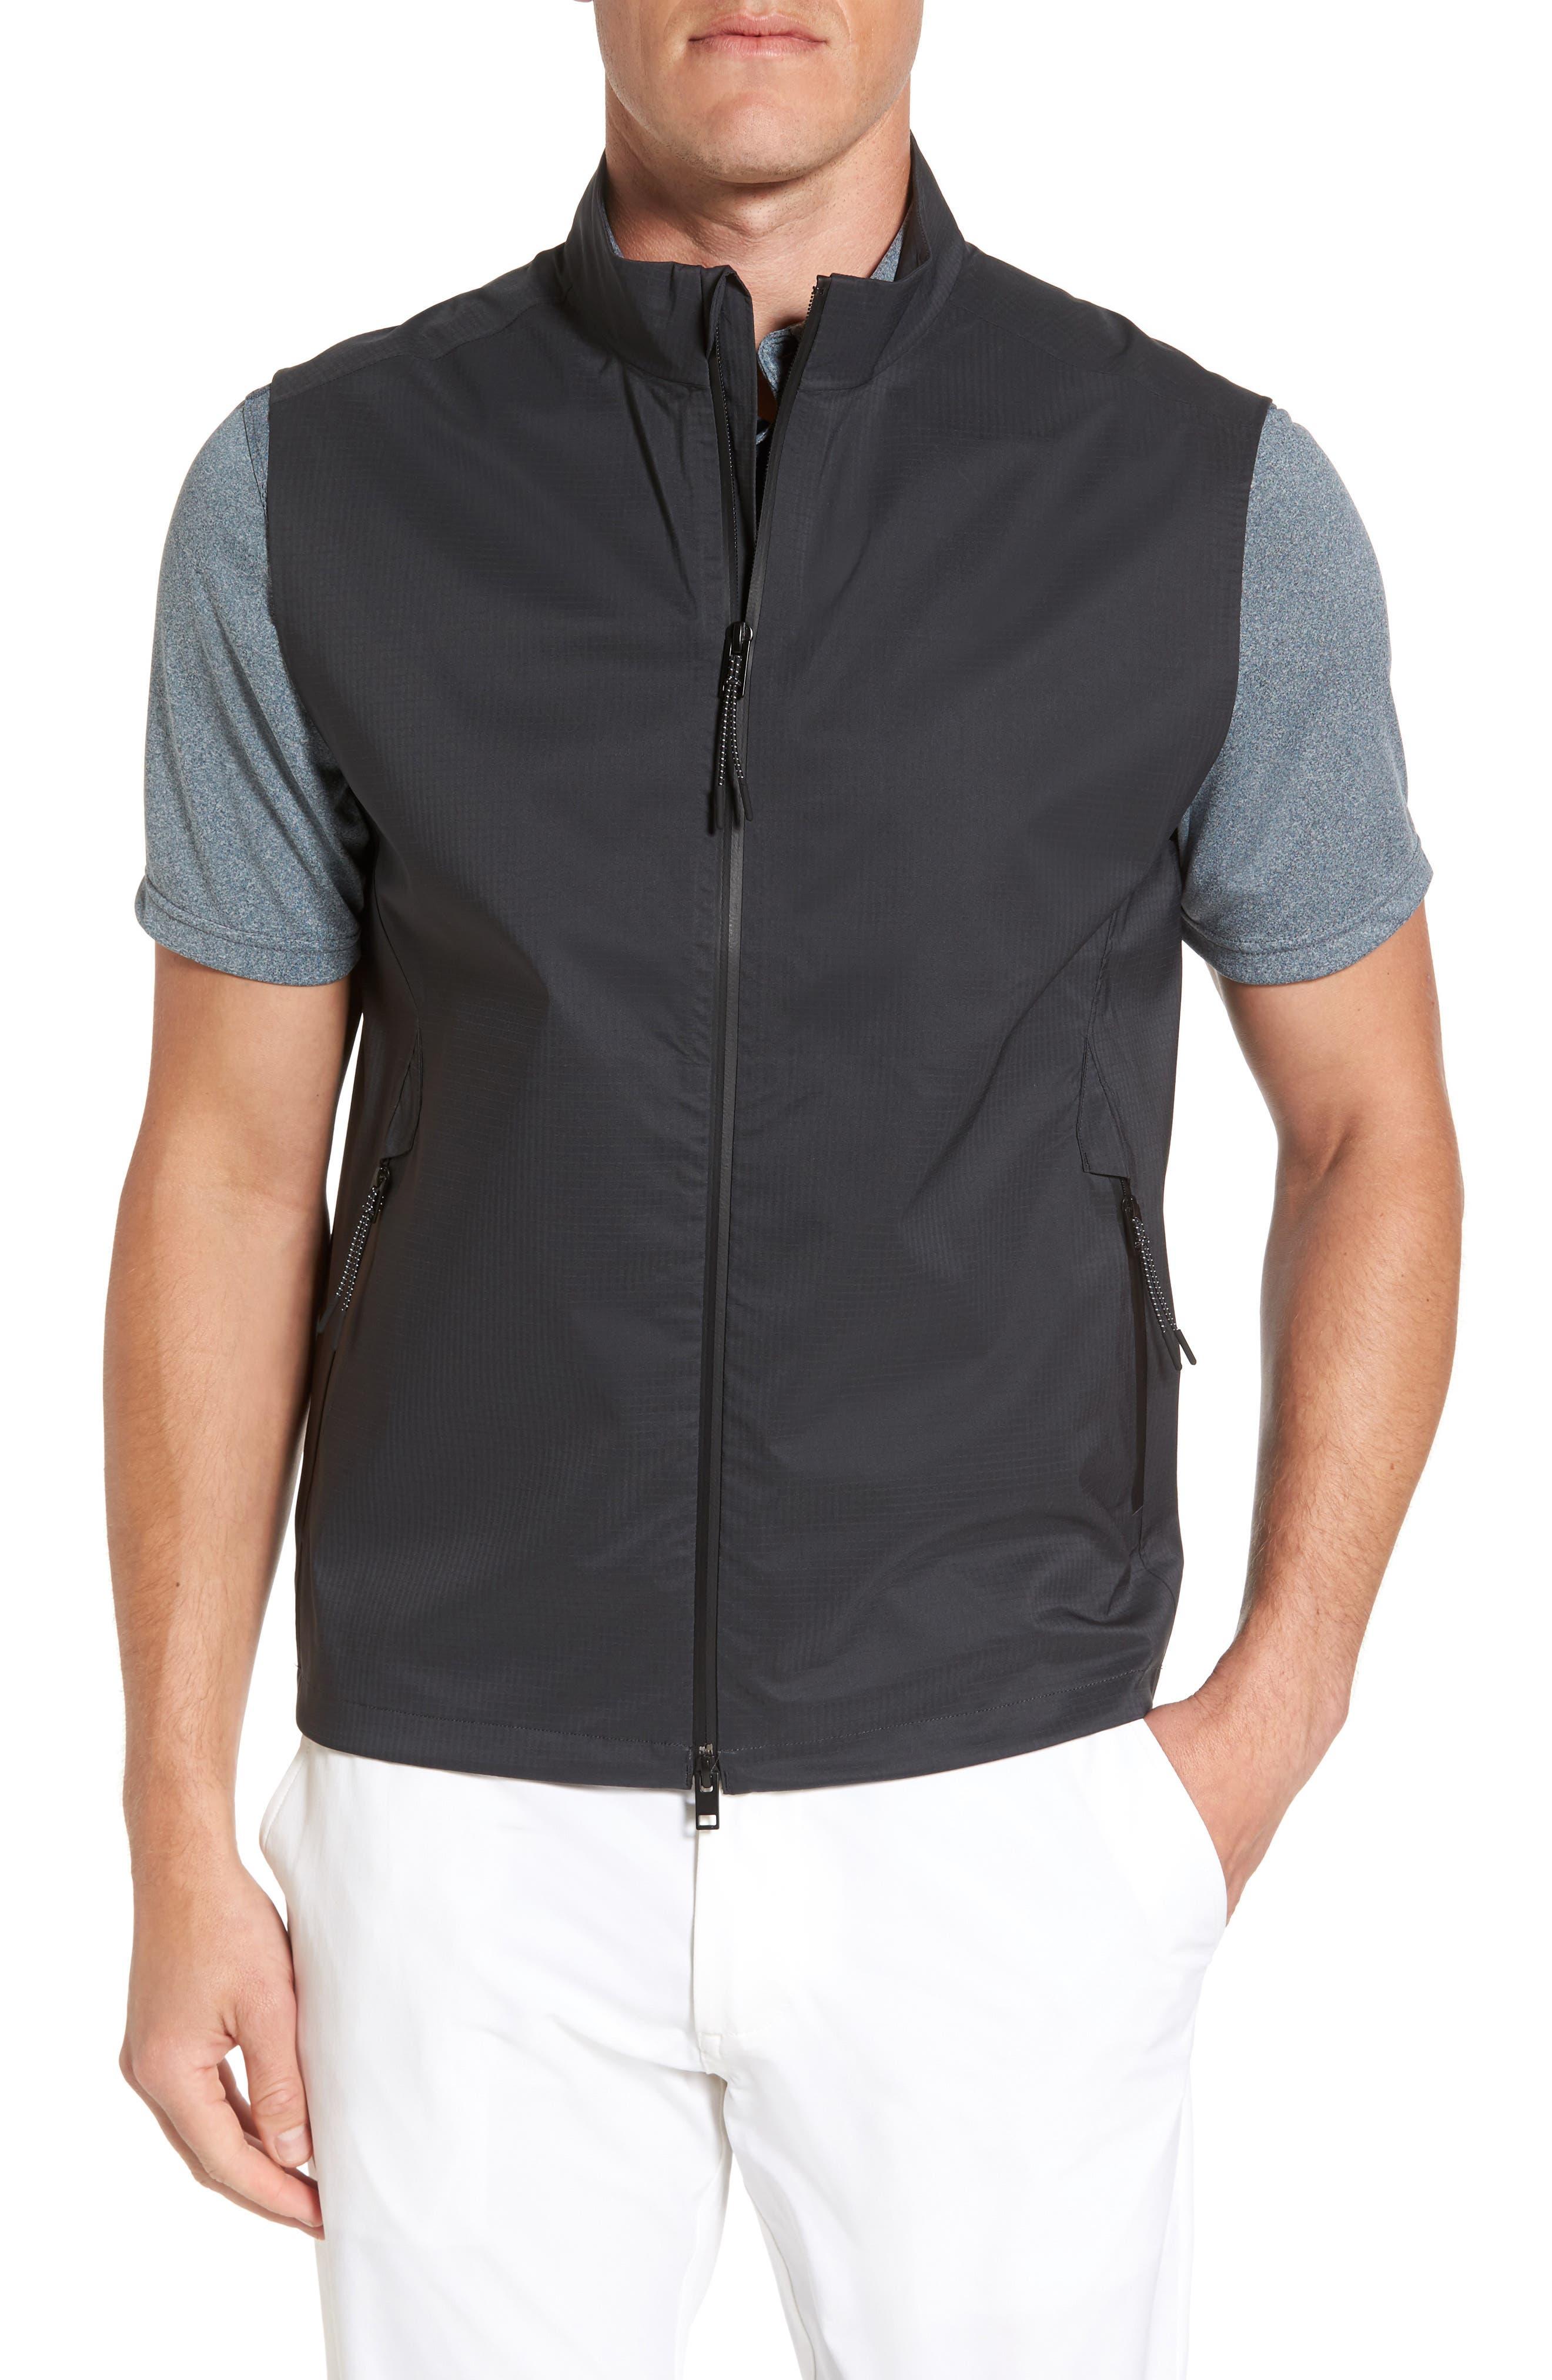 AG Newton Ripstop Vest